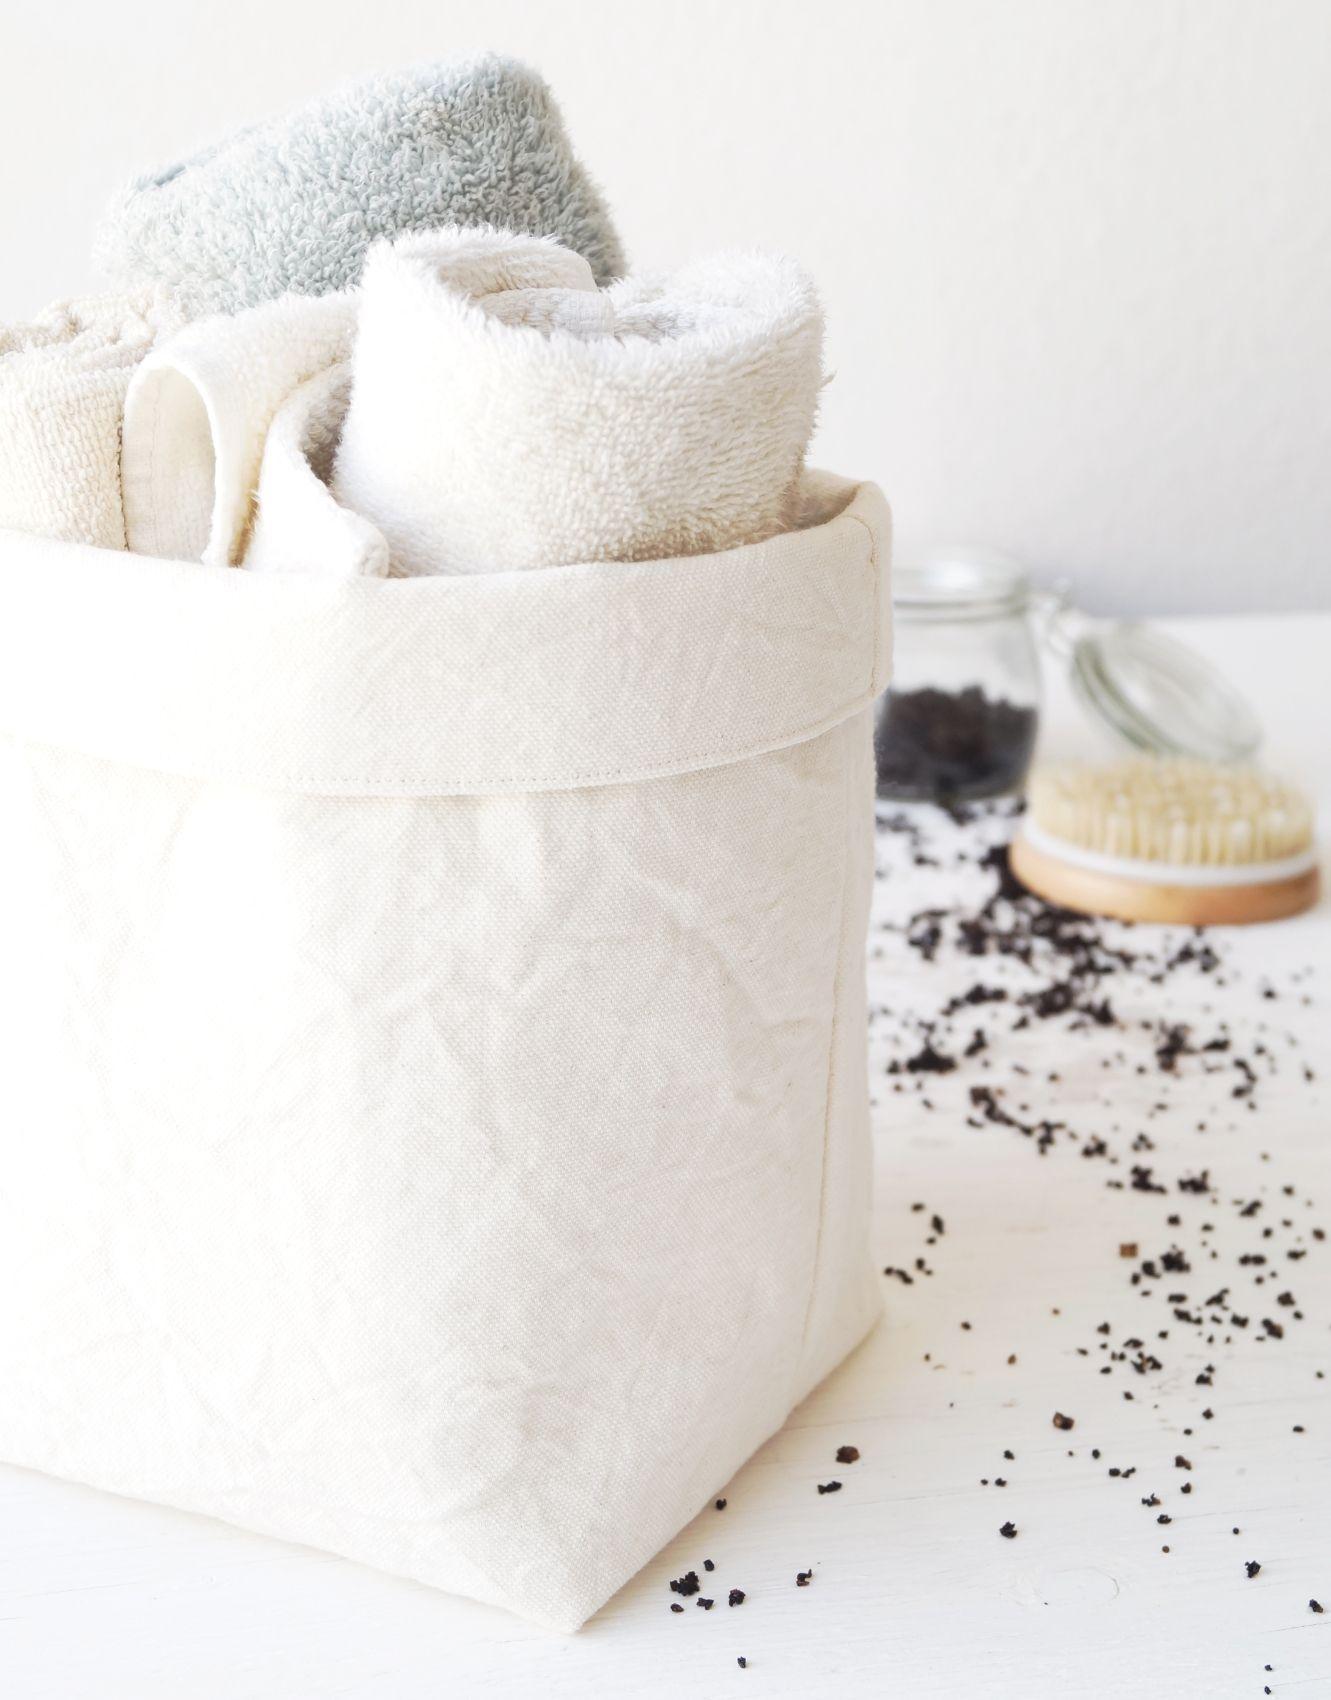 Medium storage basket. Bathroom towel holder. Fabric container ...